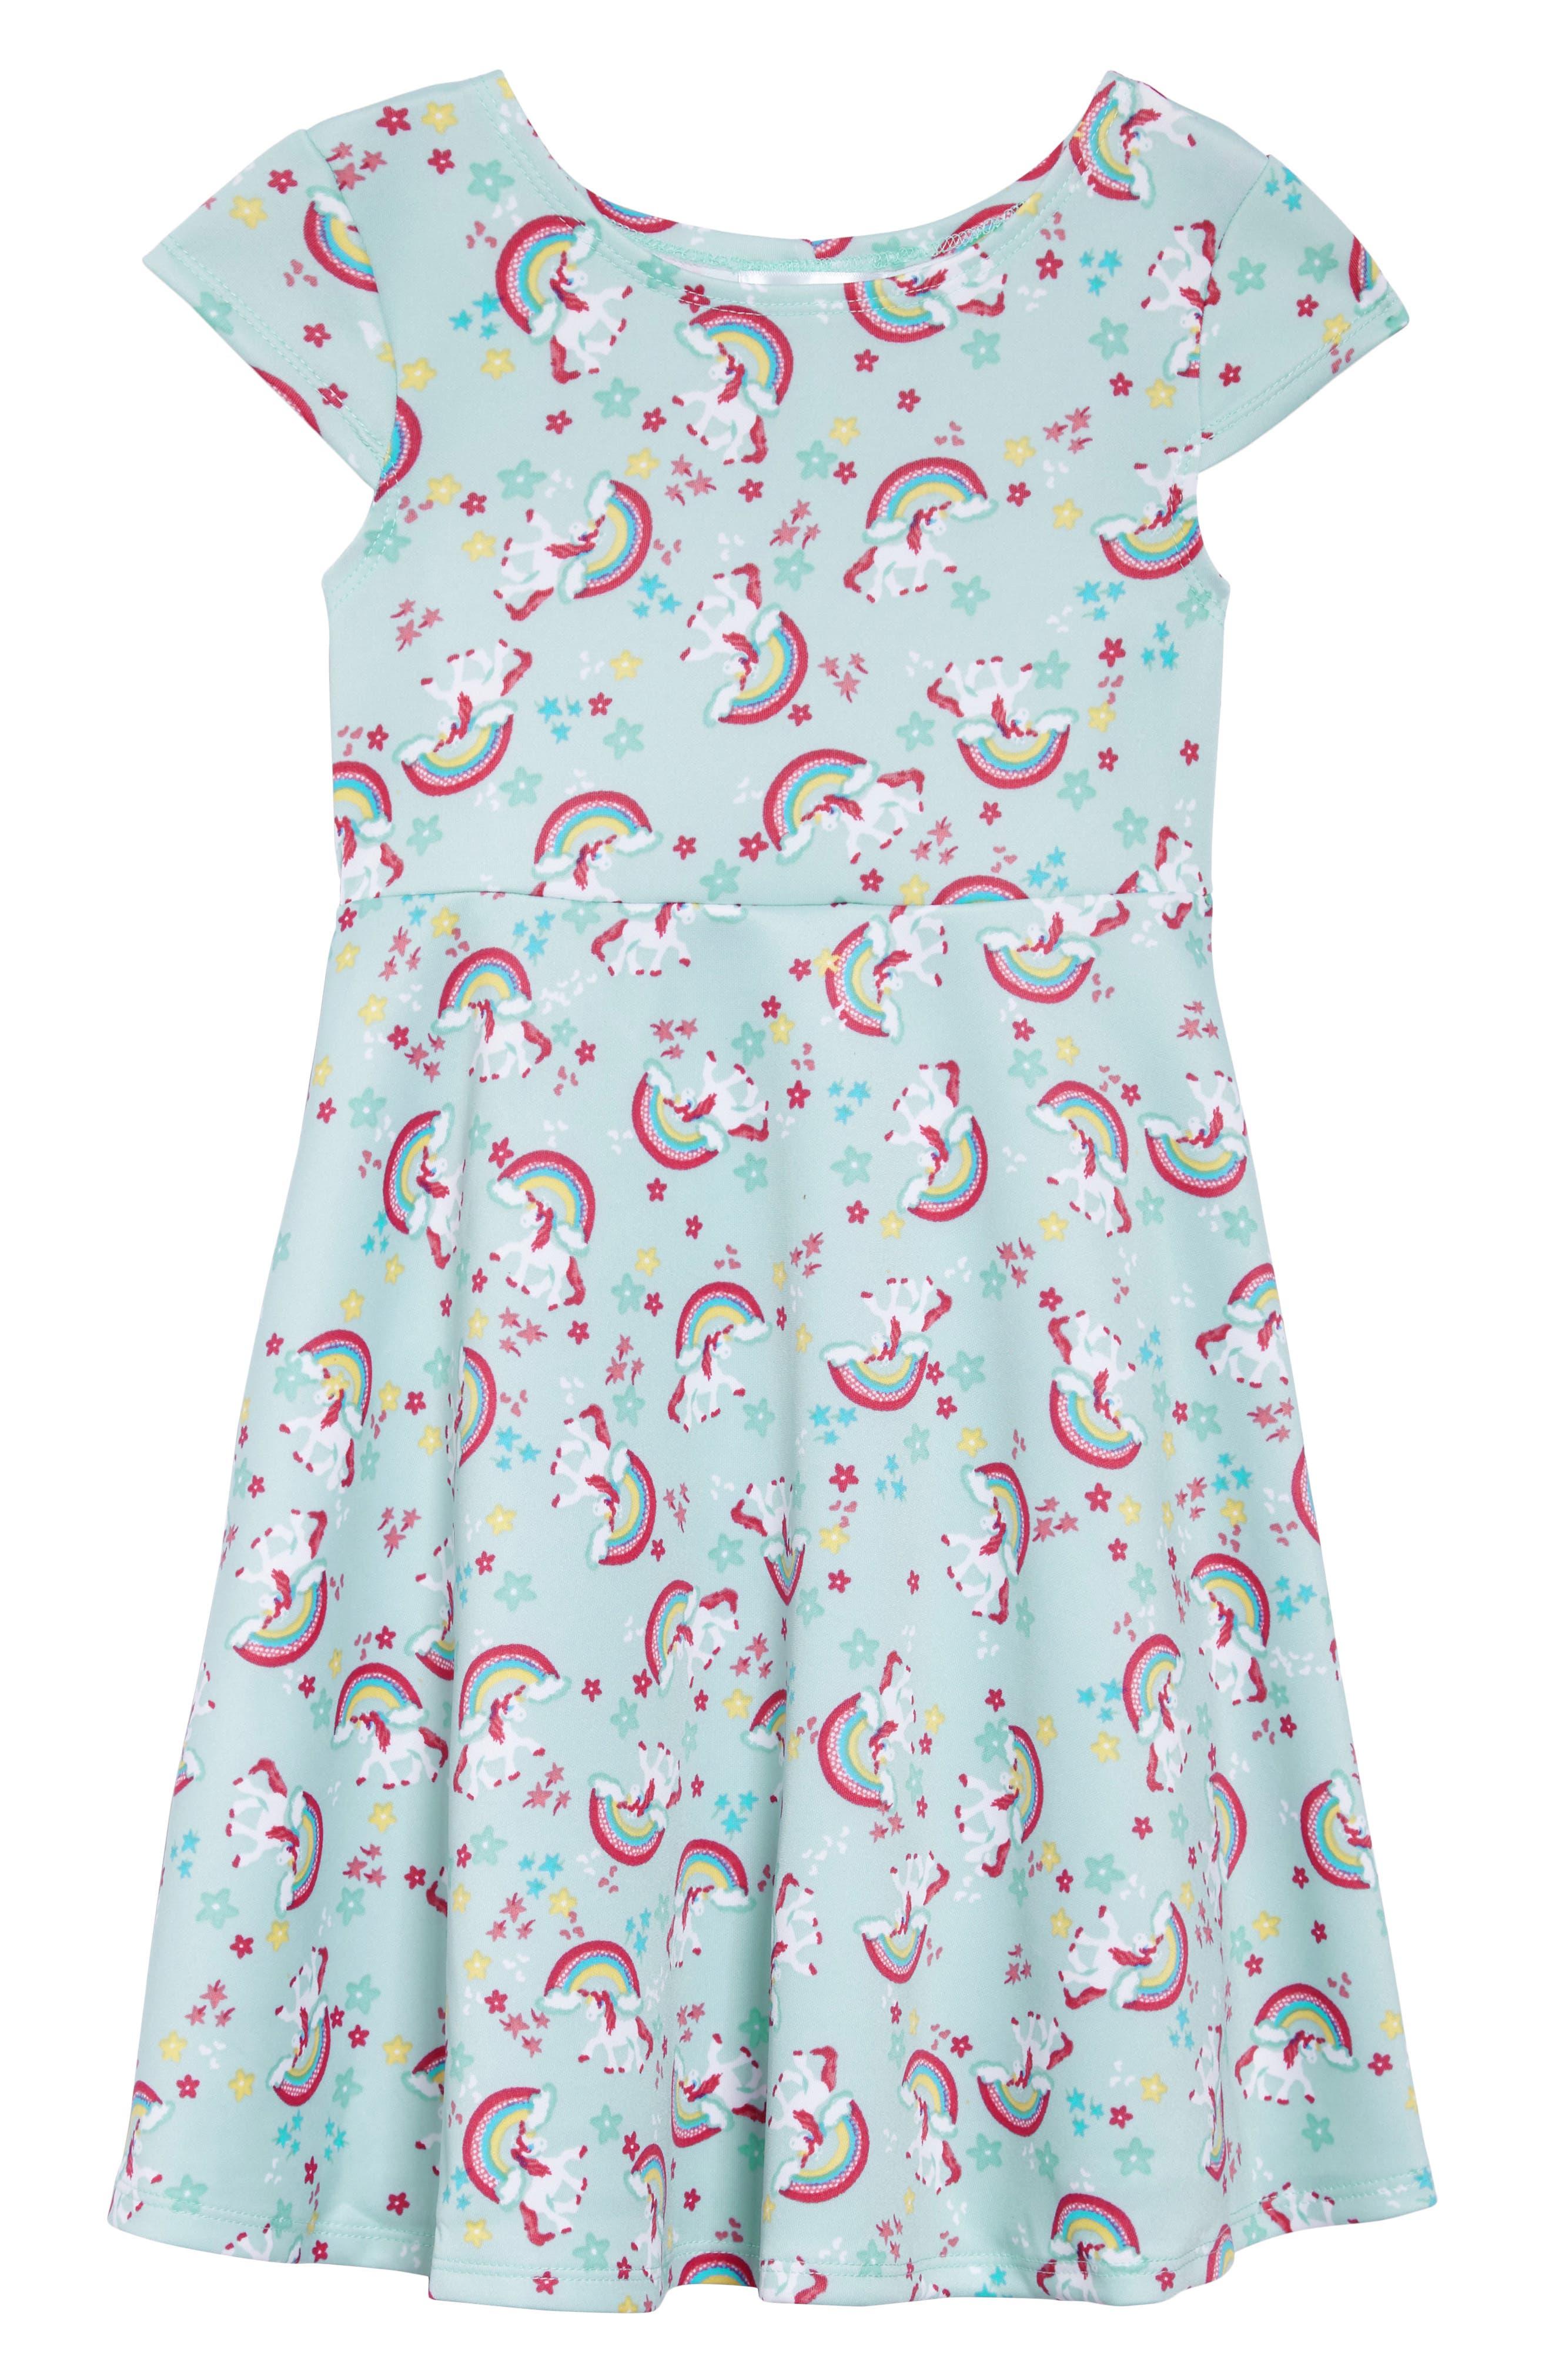 Unicorn Print Dress,                         Main,                         color, 363